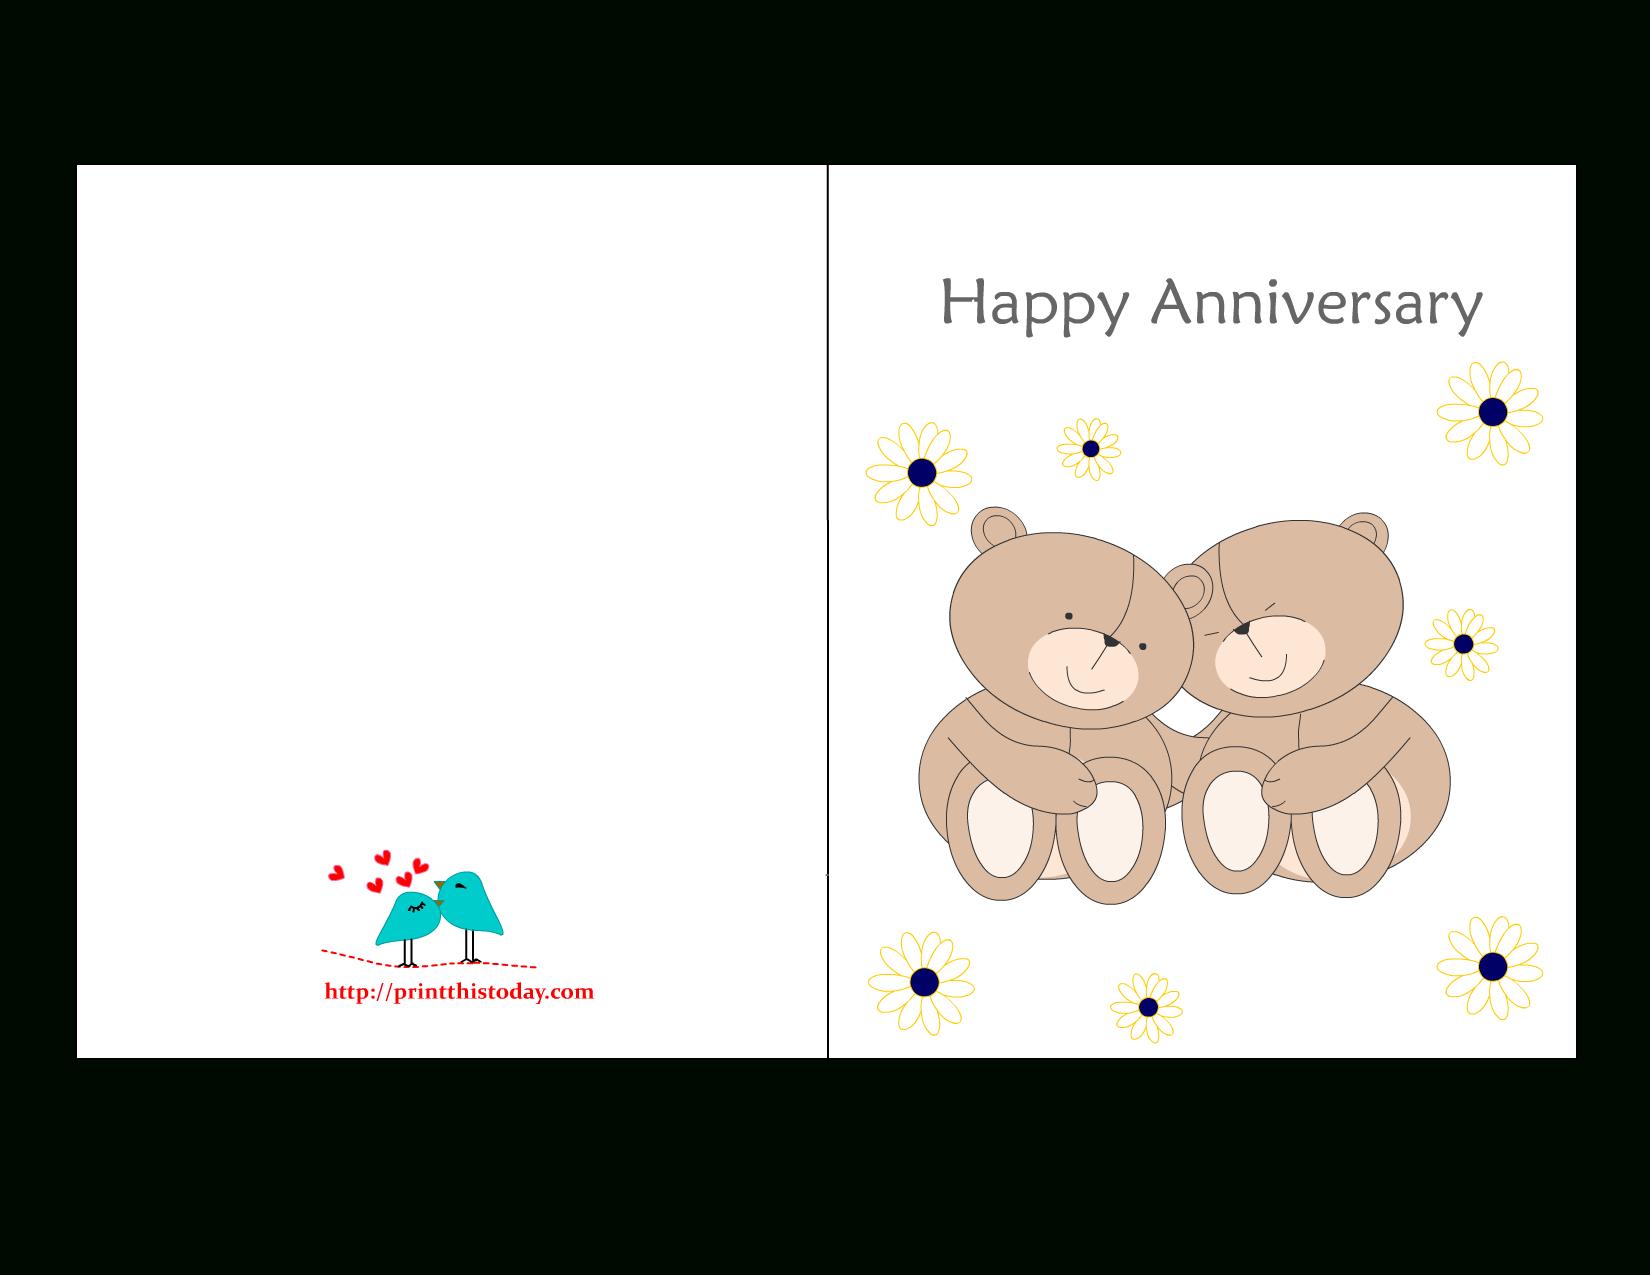 Free Printable Anniversary Cards - Free Printable Anniversary Cards